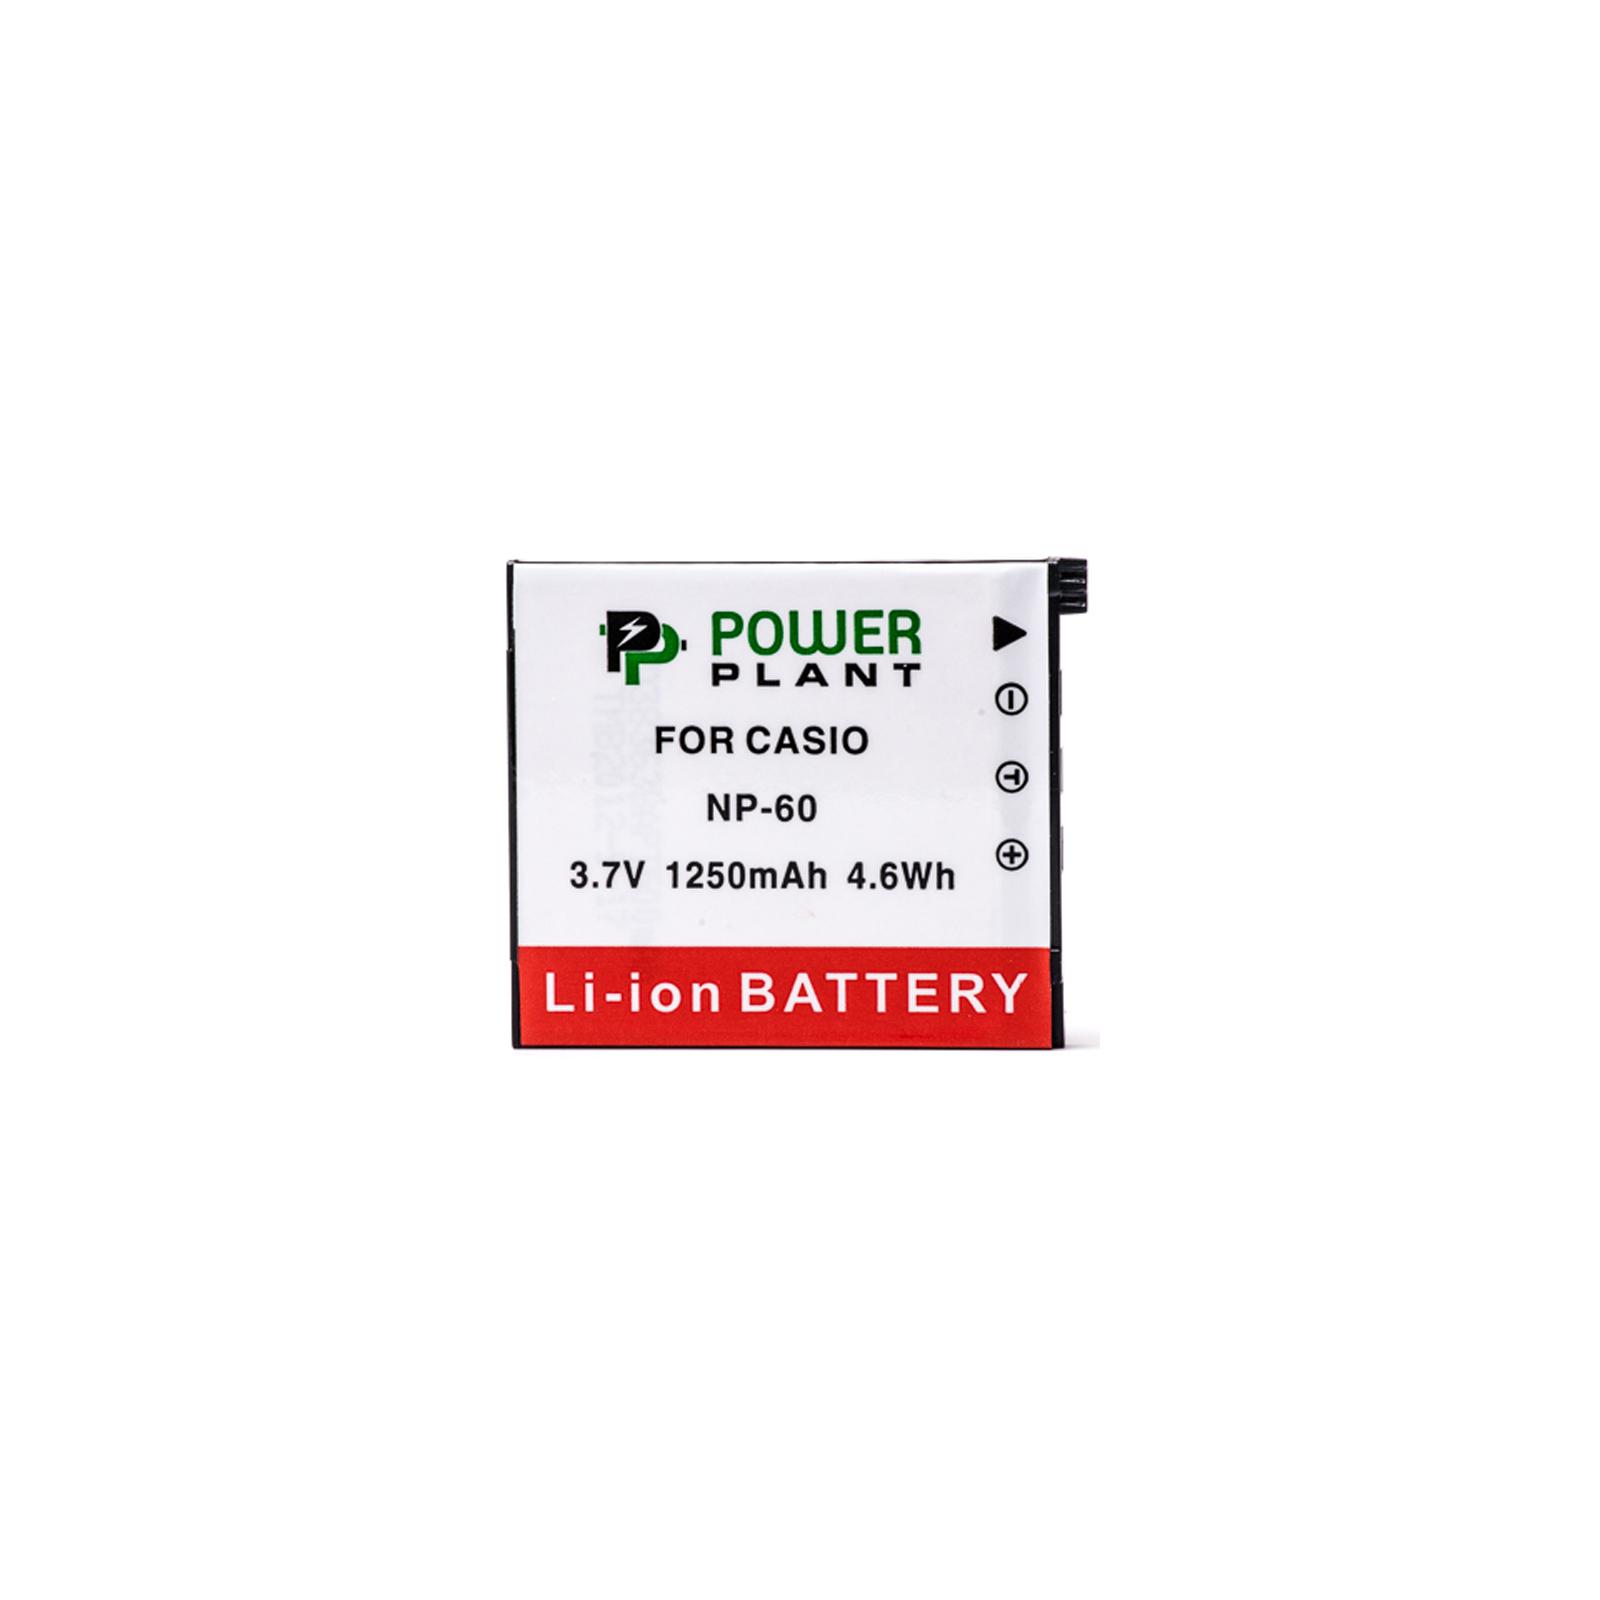 Аккумулятор к фото/видео PowerPlant Casio NP-60 (DV00DV1227) изображение 2